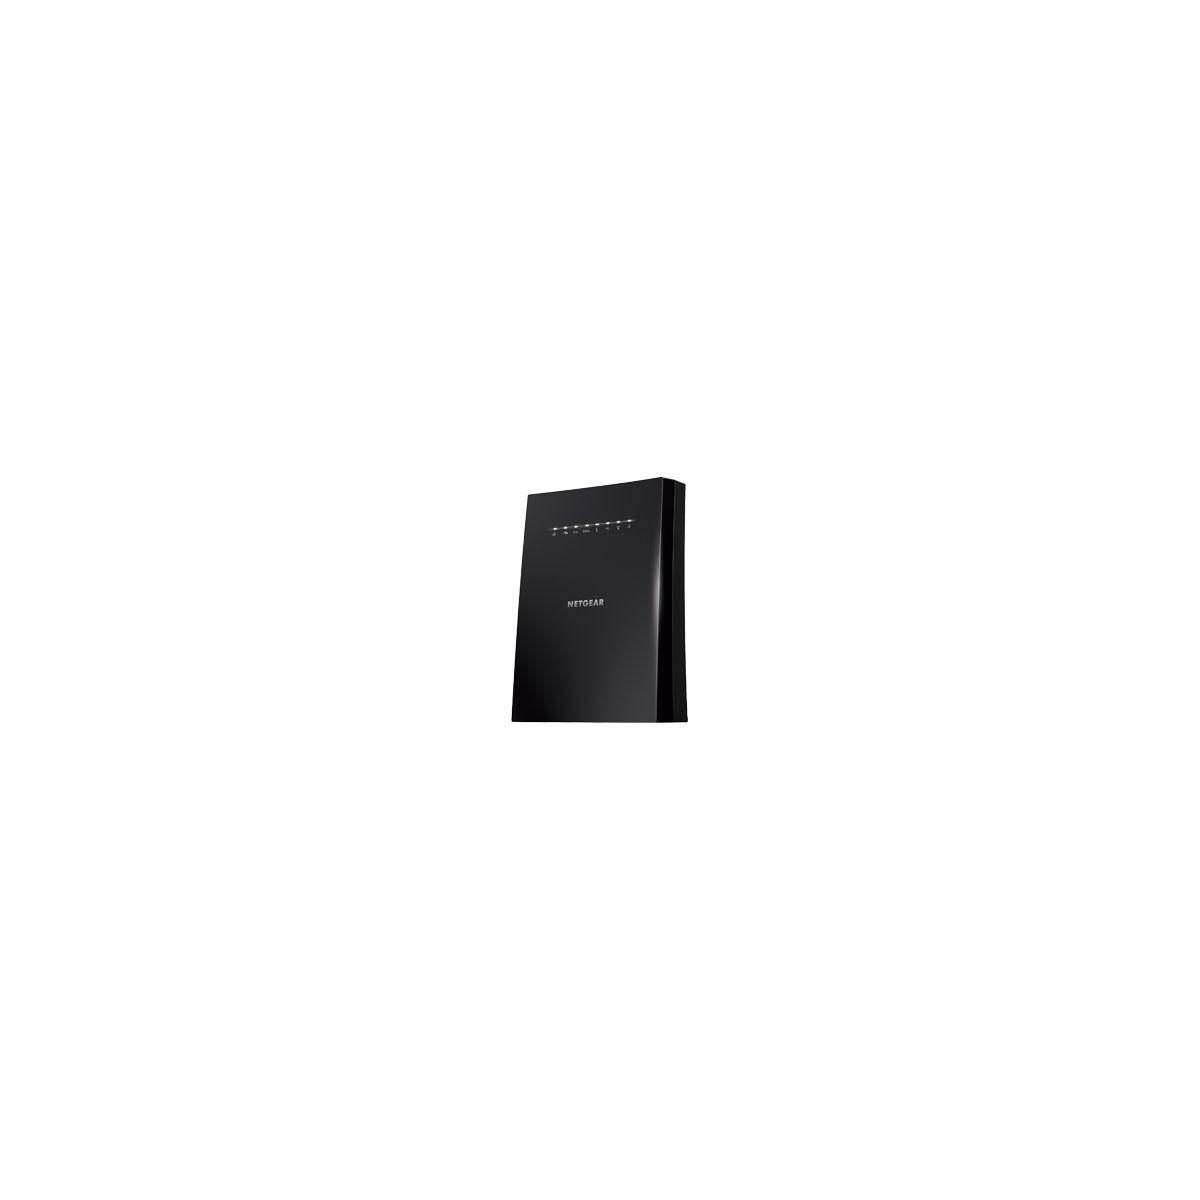 Répéteur NETGEAR Wifi Tri-Band X6S Nighthawk AC3000